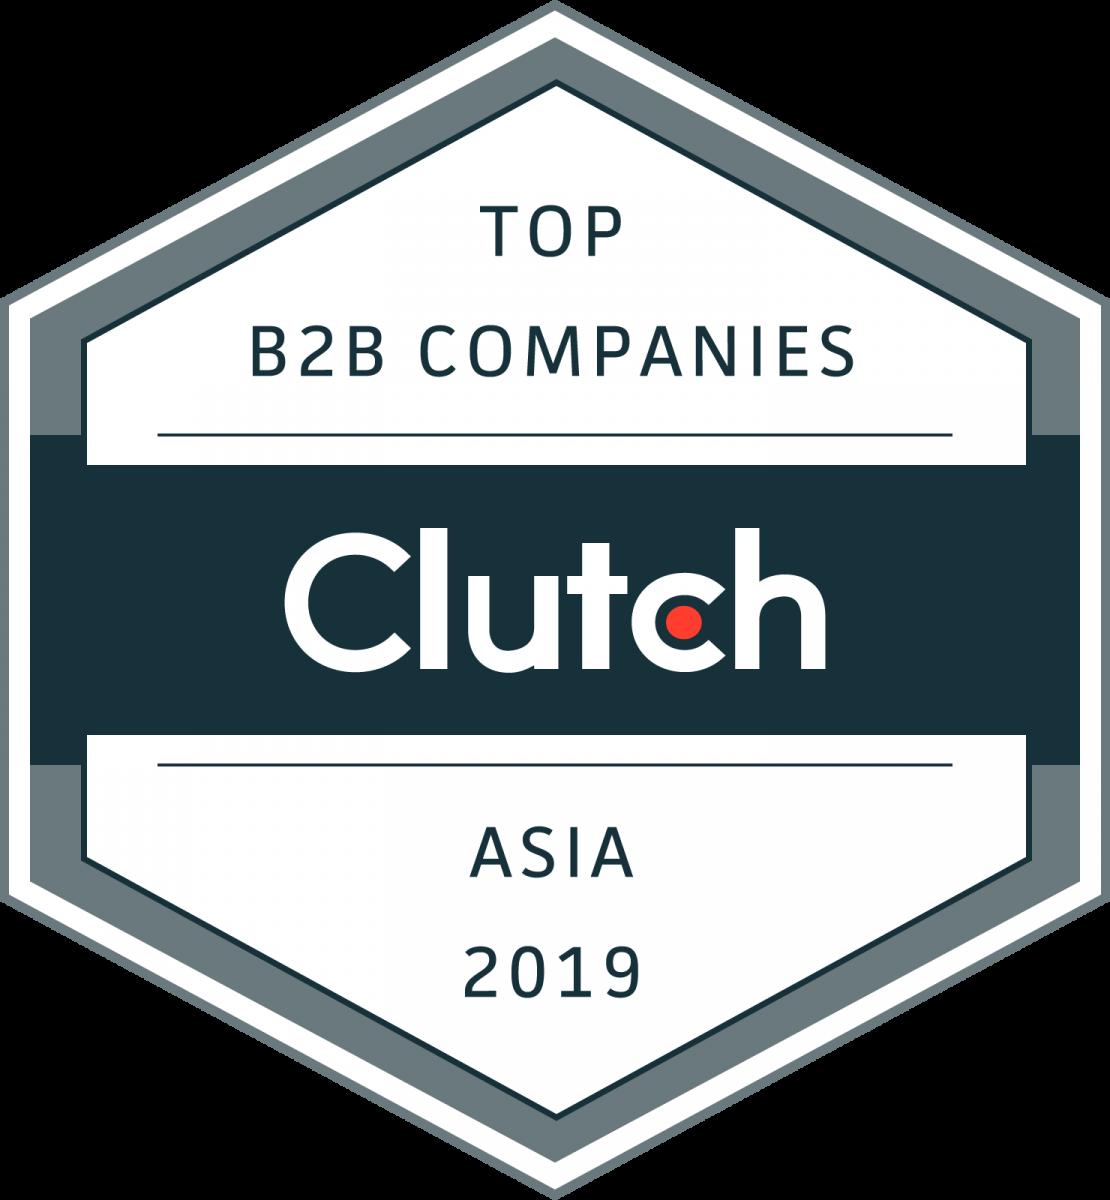 Top B2B Companies Asia